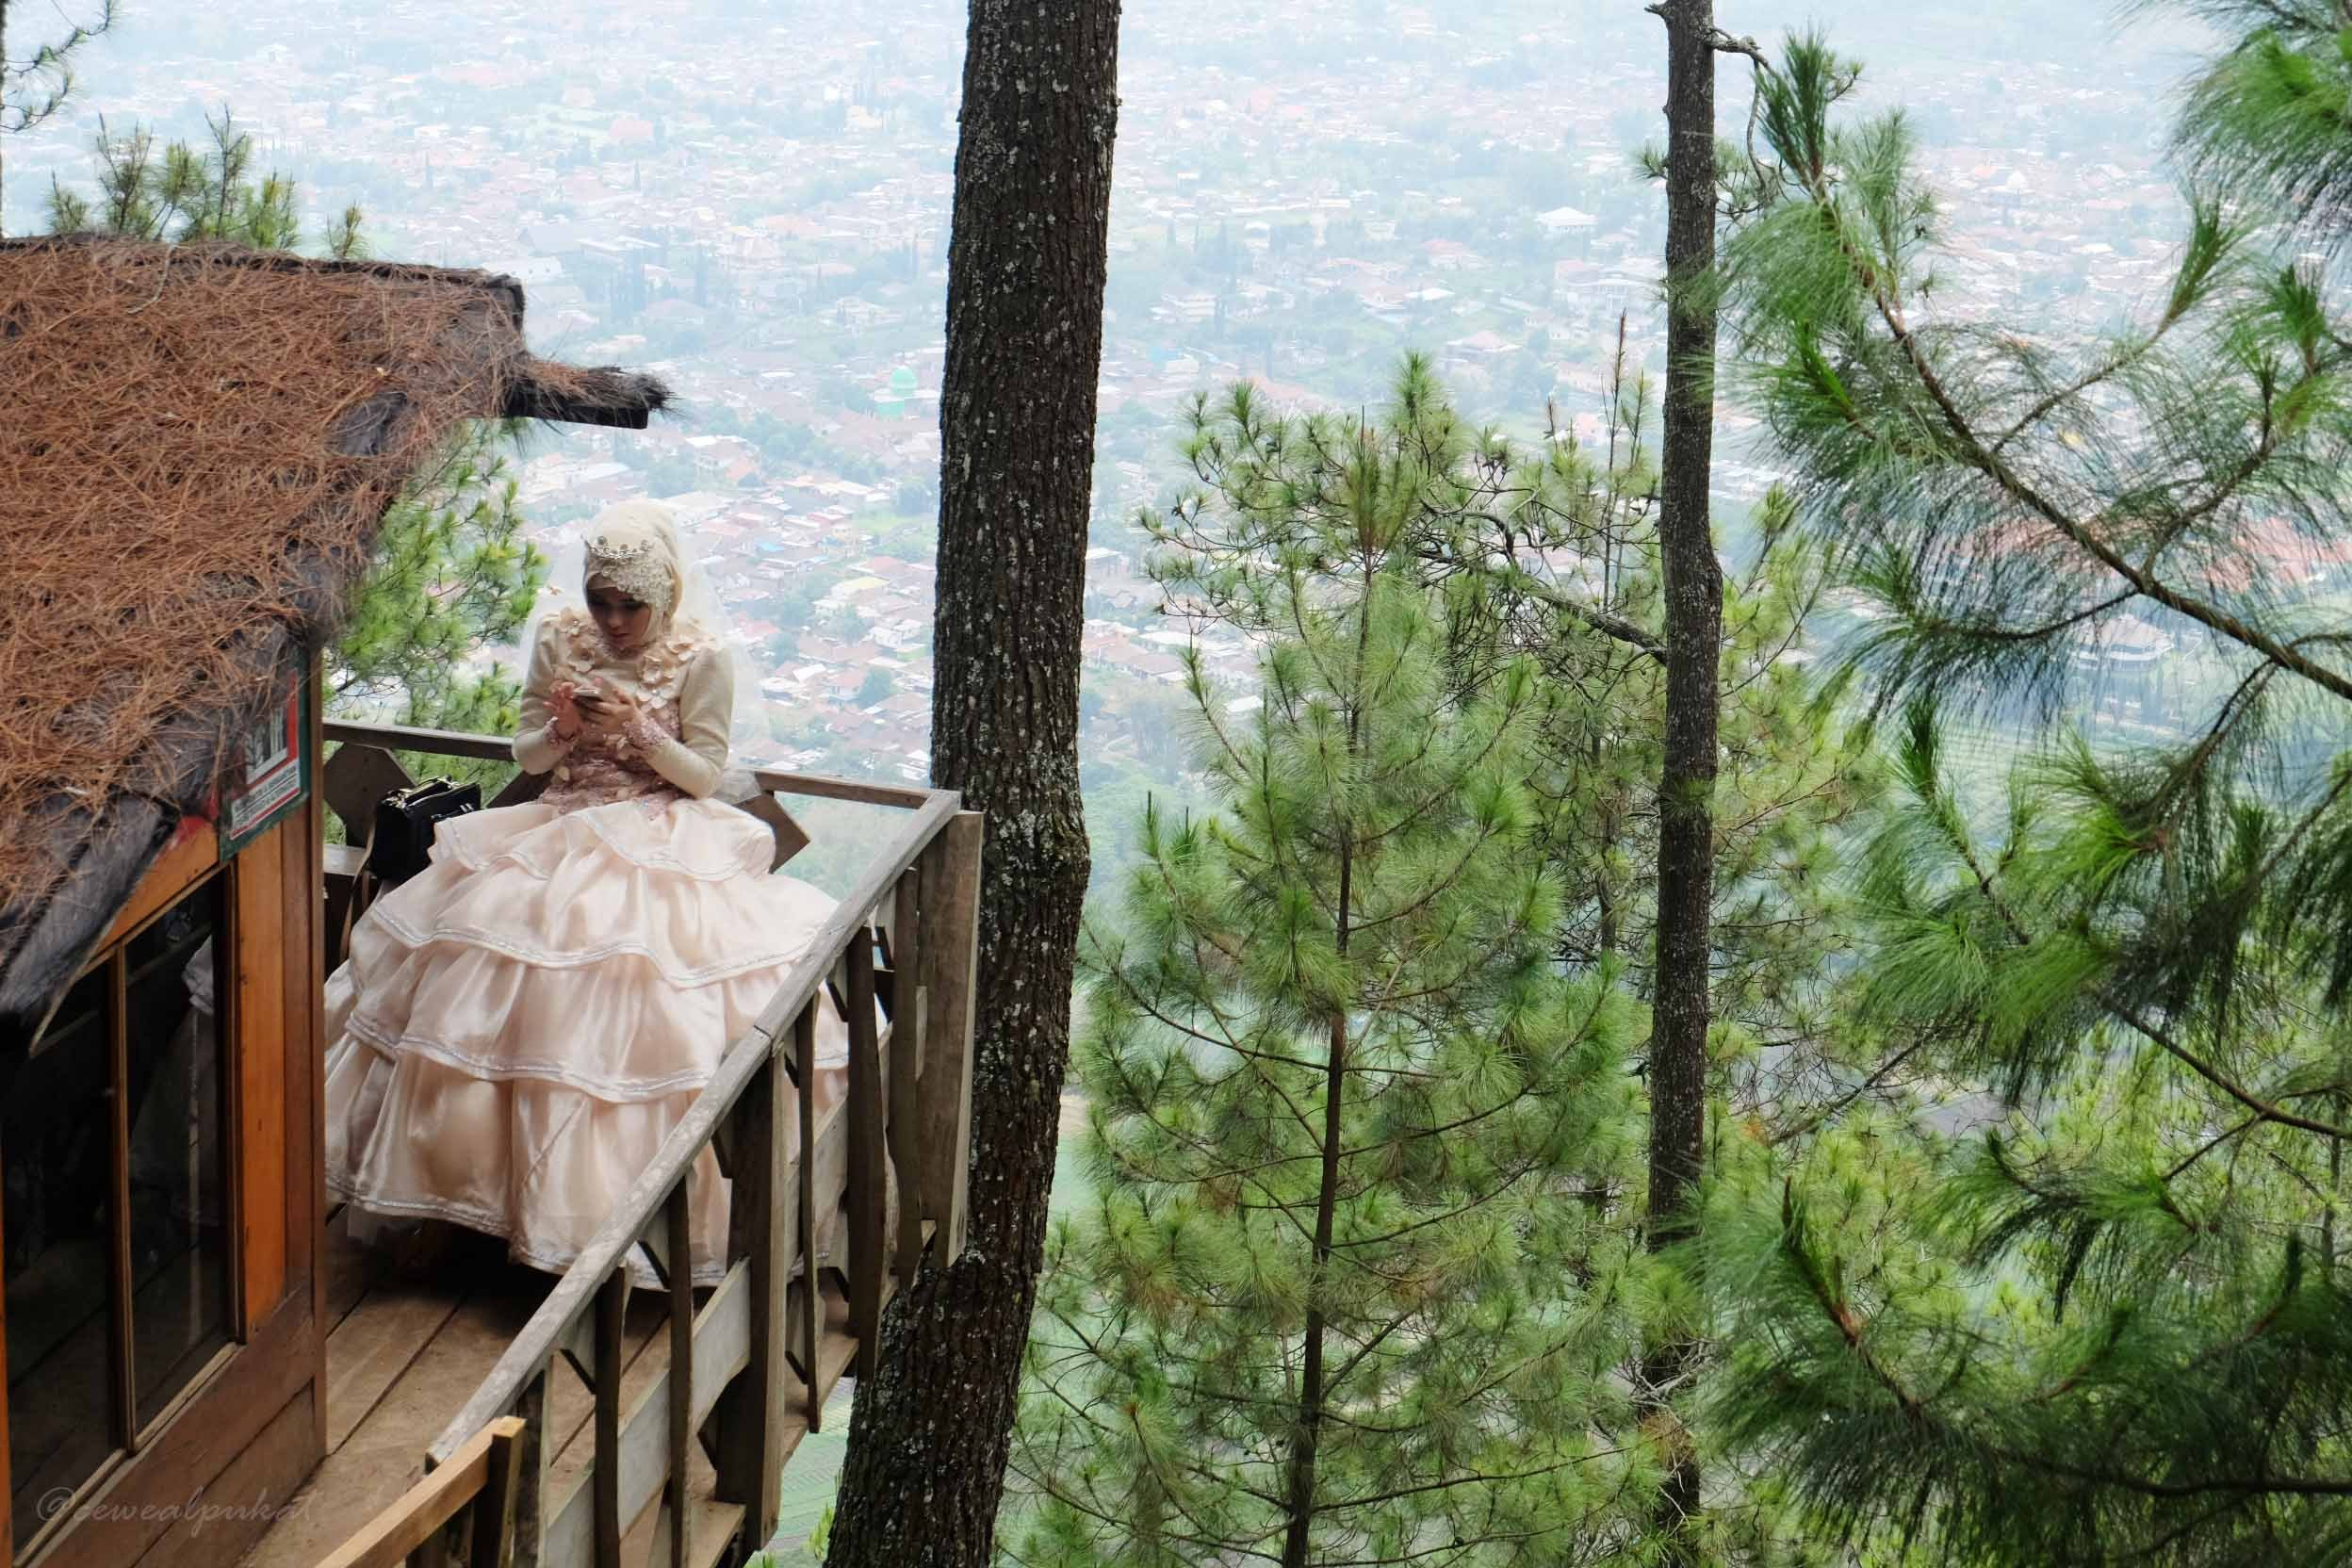 Omah Kayu Paralayang Batu Malang Spot Romantis Melamar Pasangan Siapa